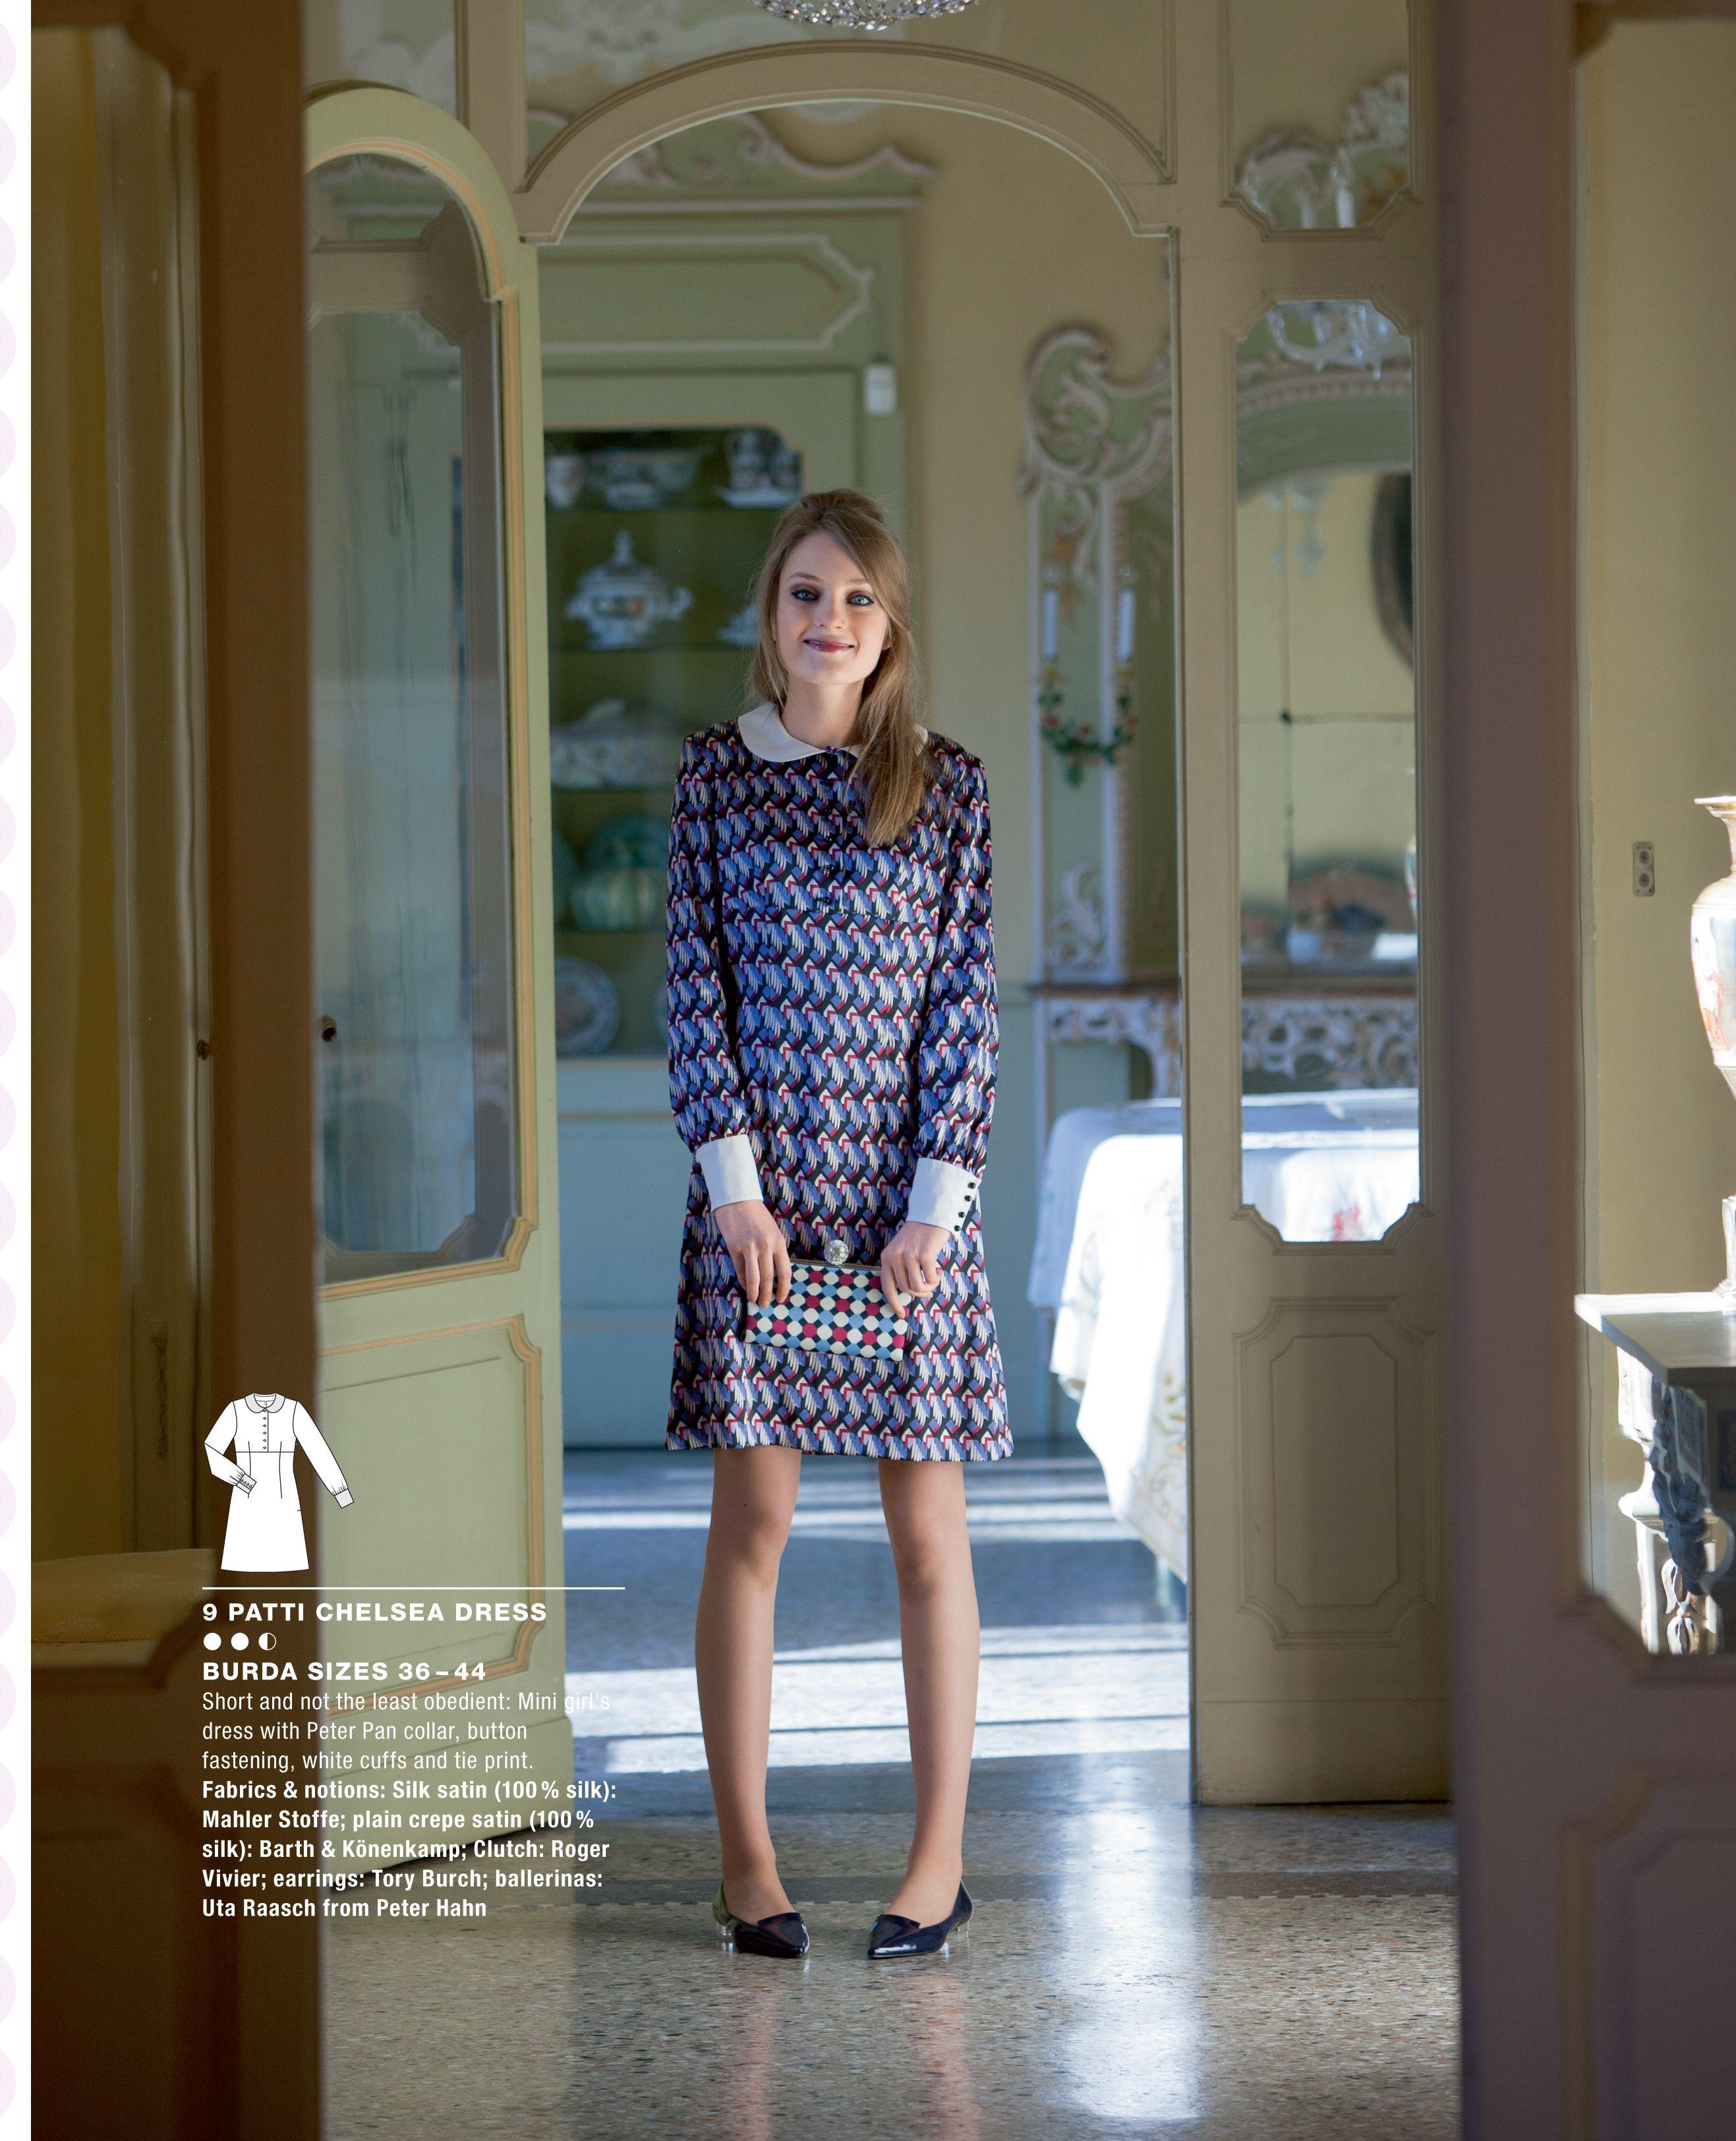 Patti Chelsea Dress from Burda Style special vintage magazine ...